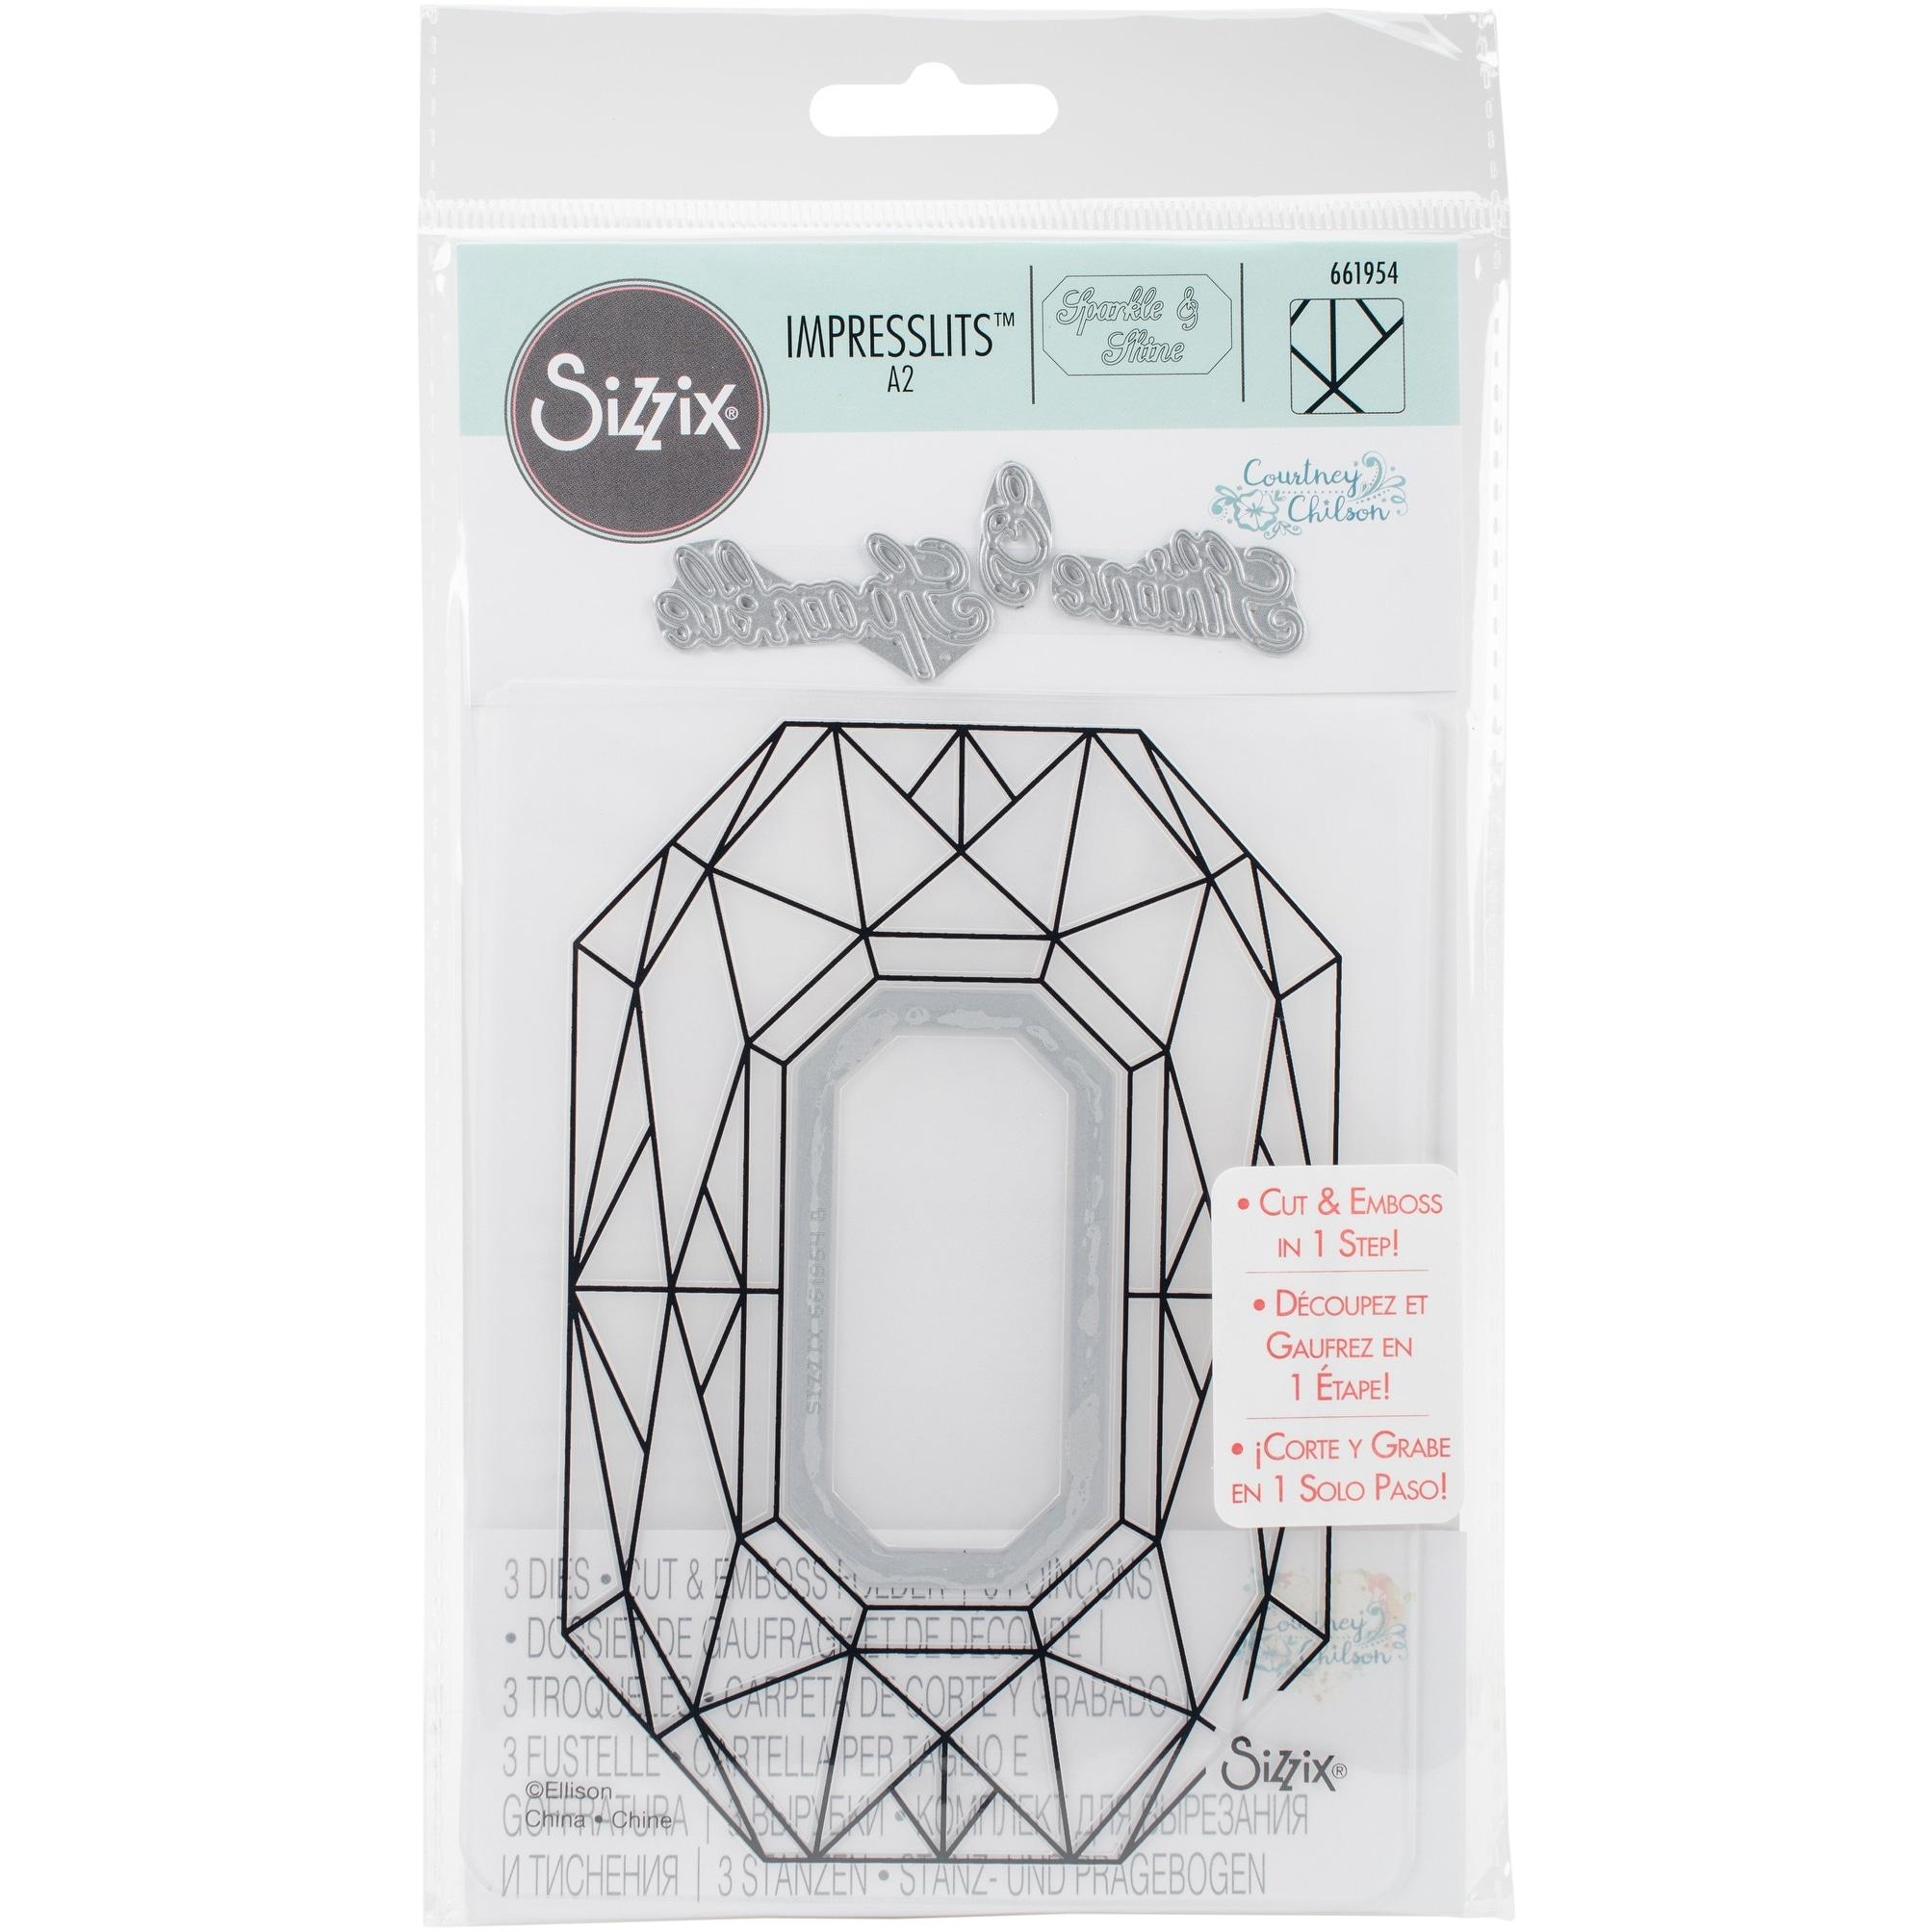 Sizzix 661954 Diamond Geometrics Impresslits Embossing Folder